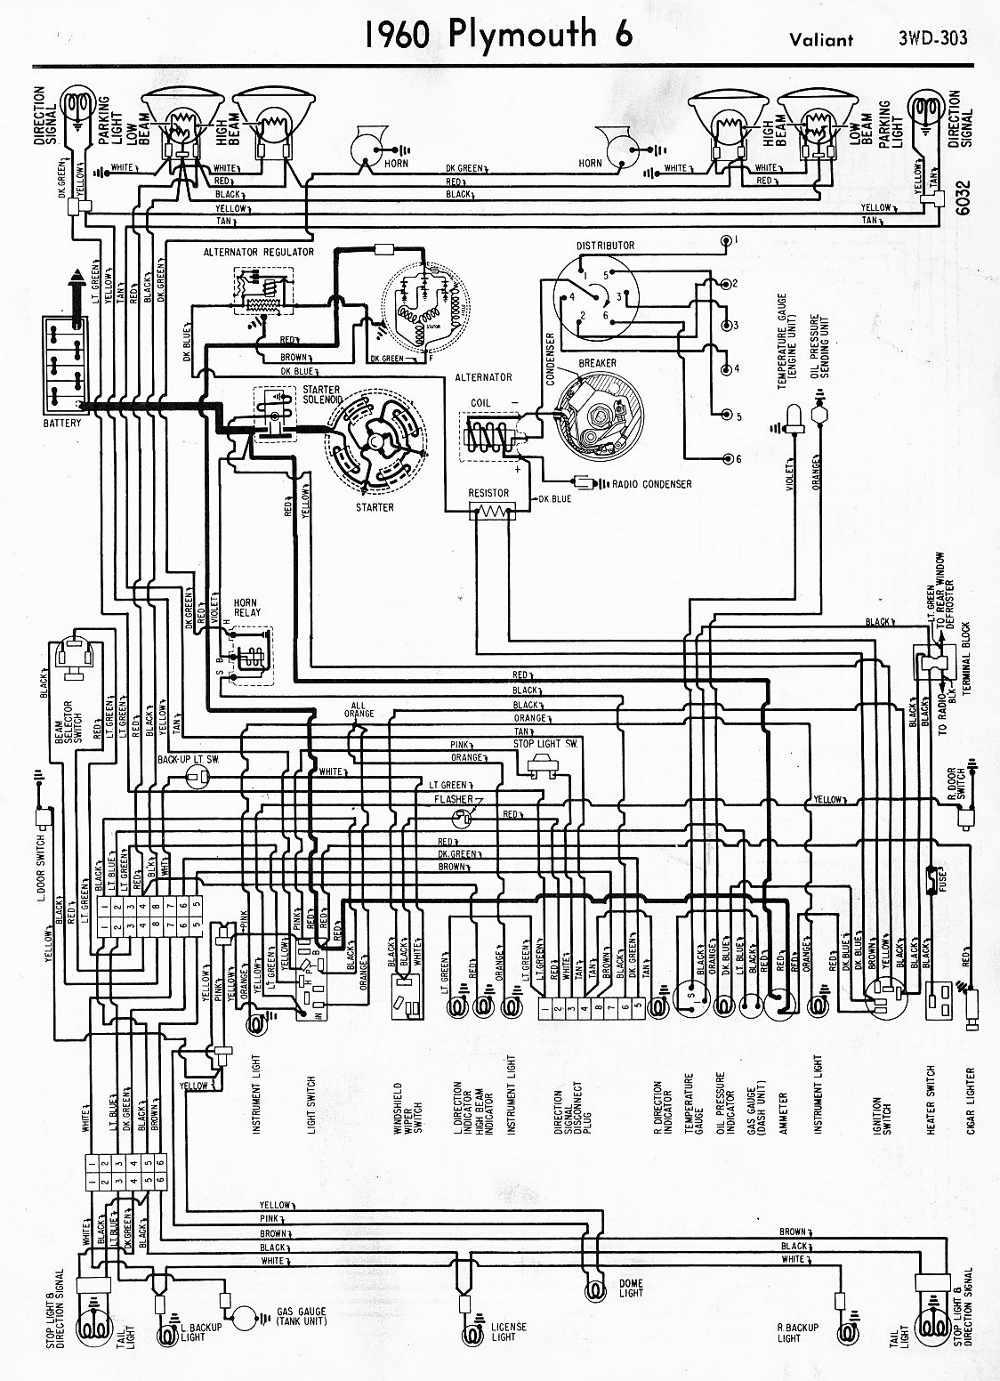 medium resolution of chrysler valiant wiring diagram simple wiring diagram dodge dakota wiring diagrams 1966 plymouth valiant wiring diagram